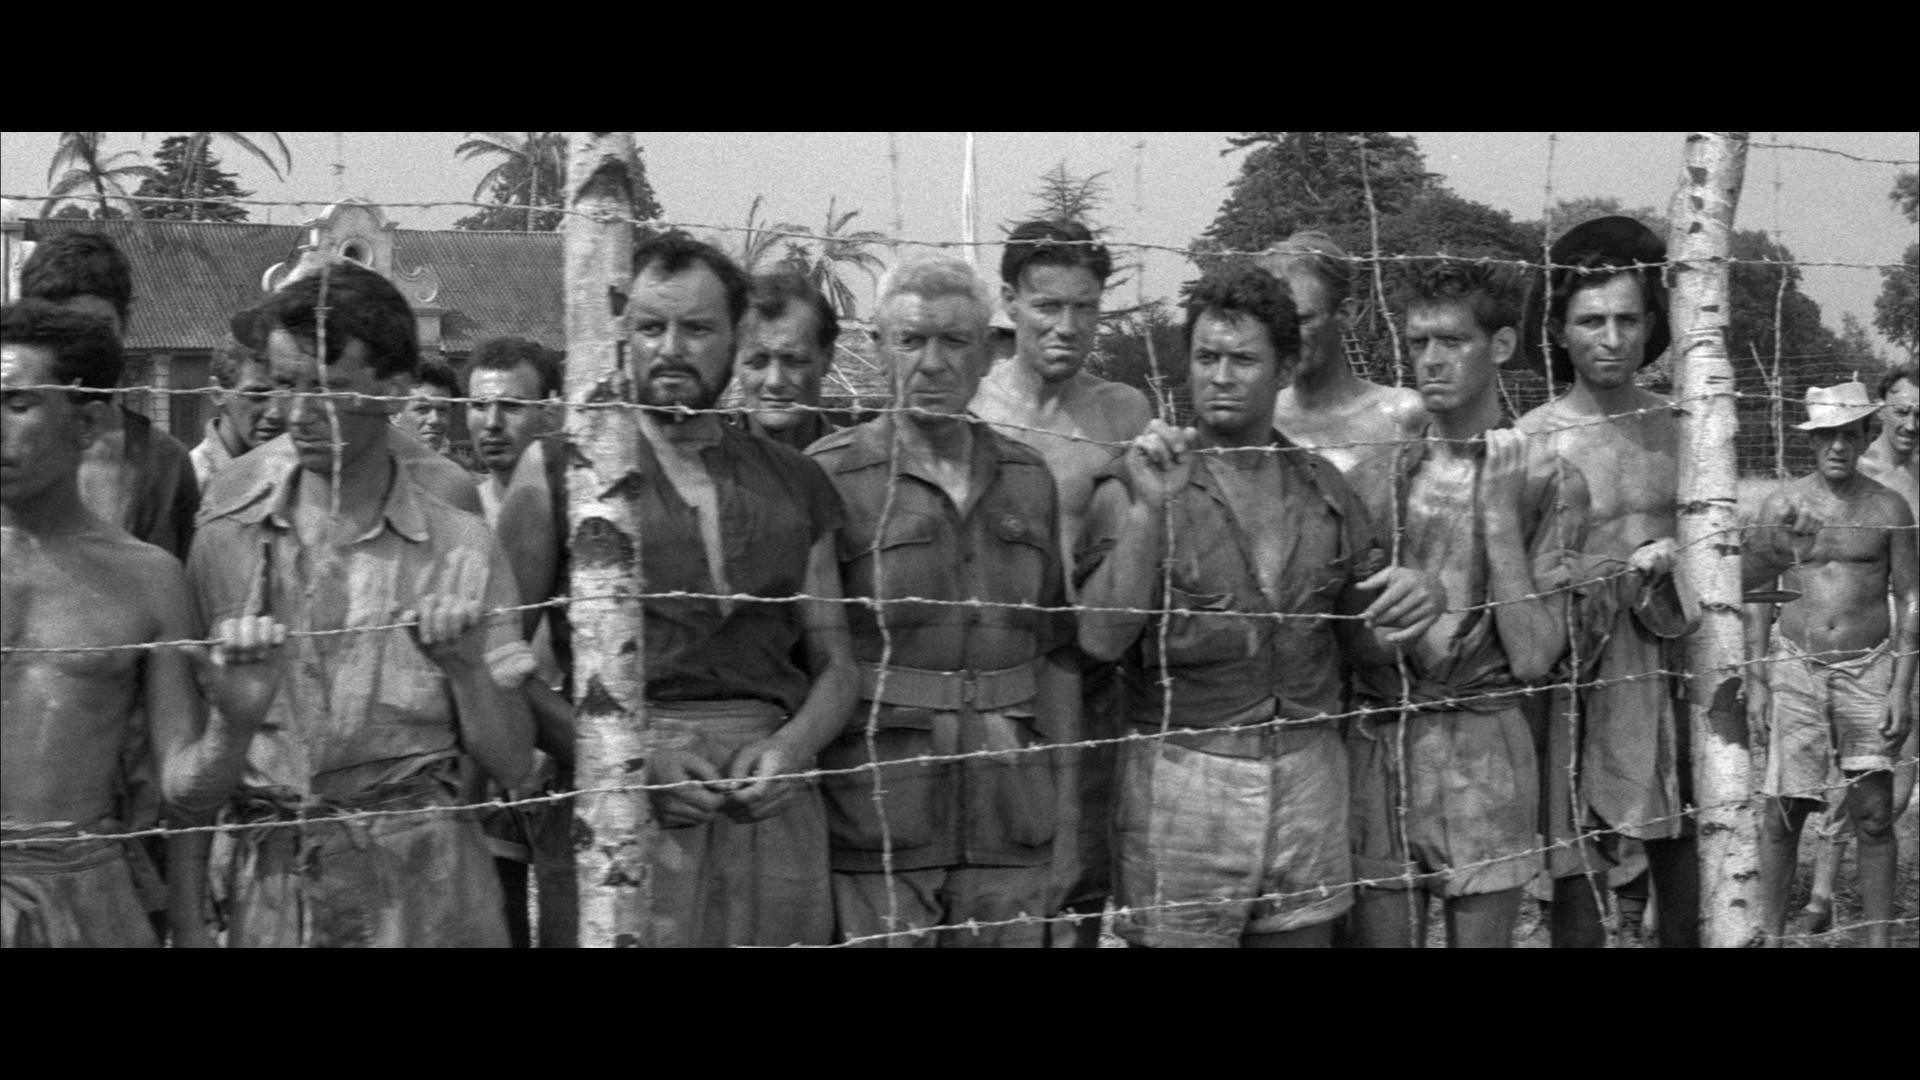 Camp on Blood Island (1958)